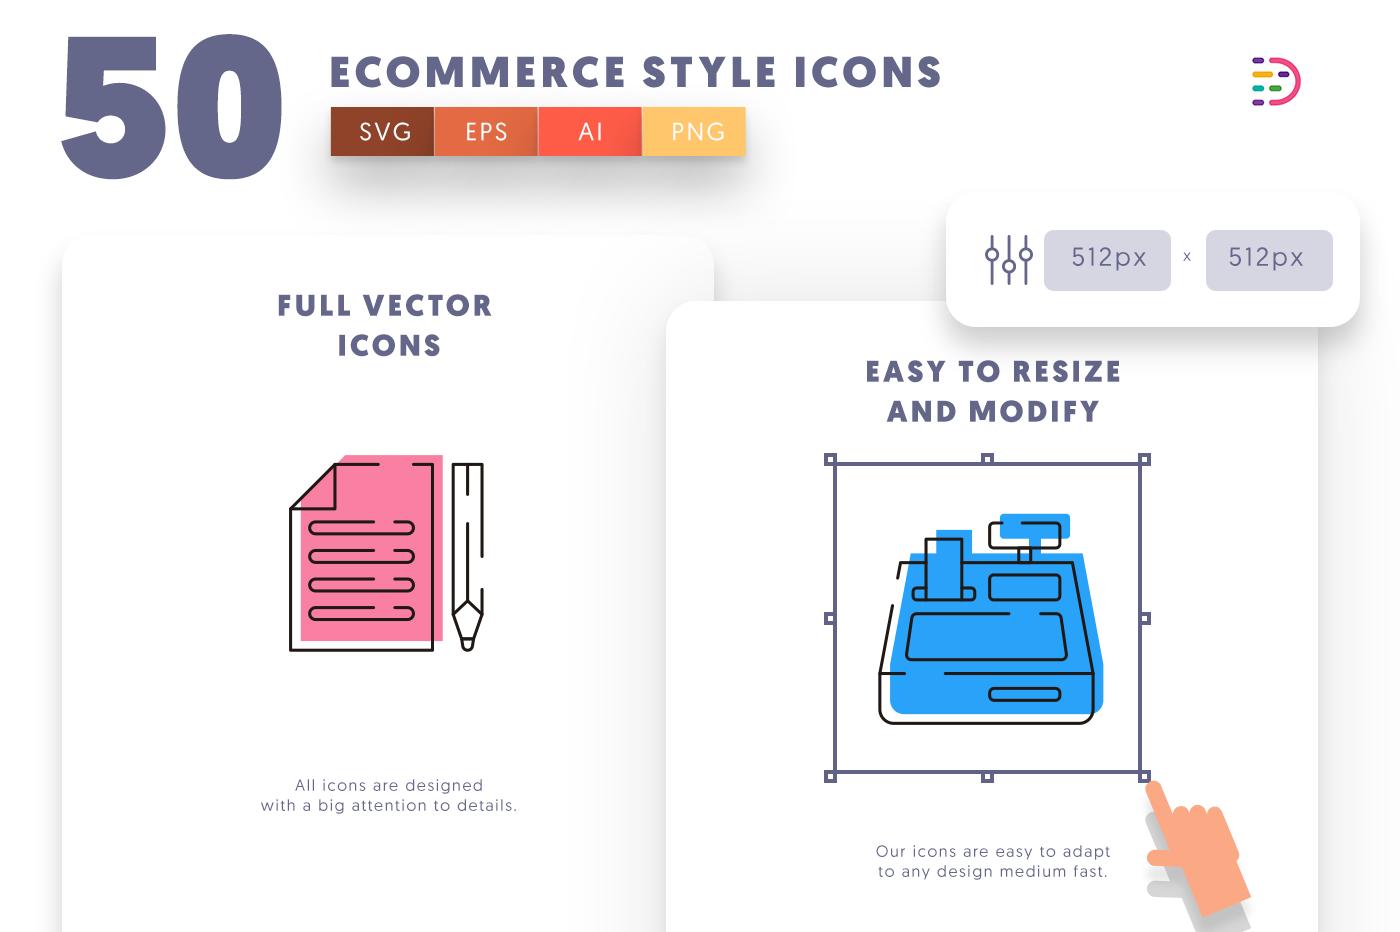 Full vector 50EcommerceLine Icons